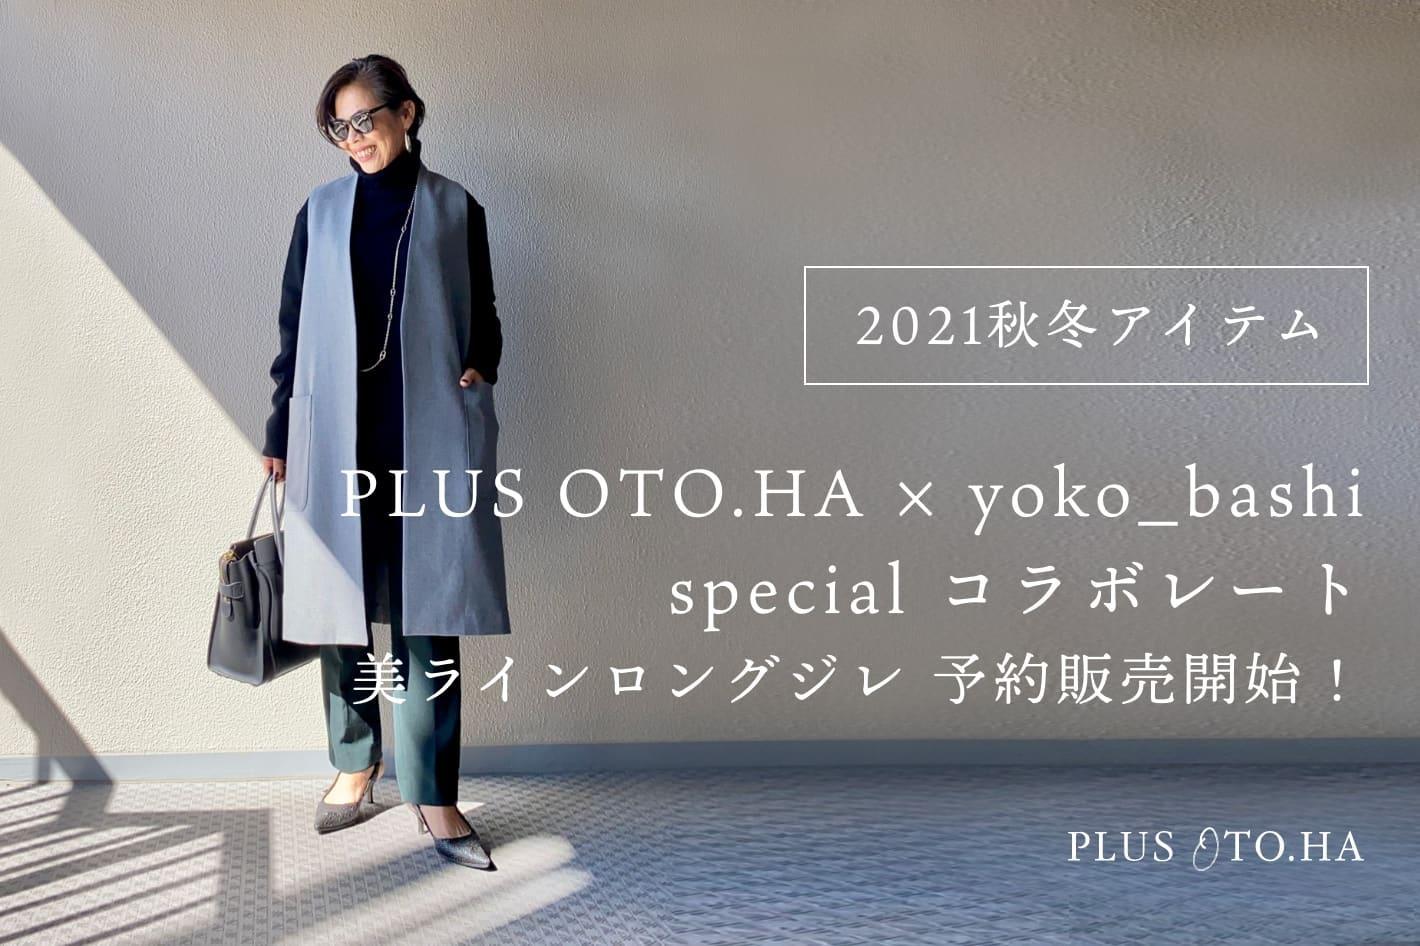 PLUS OTO.HA PLUS OTO.HA × yoko_bashi specialコラボレート 美ラインロングジレ予約販売開始!